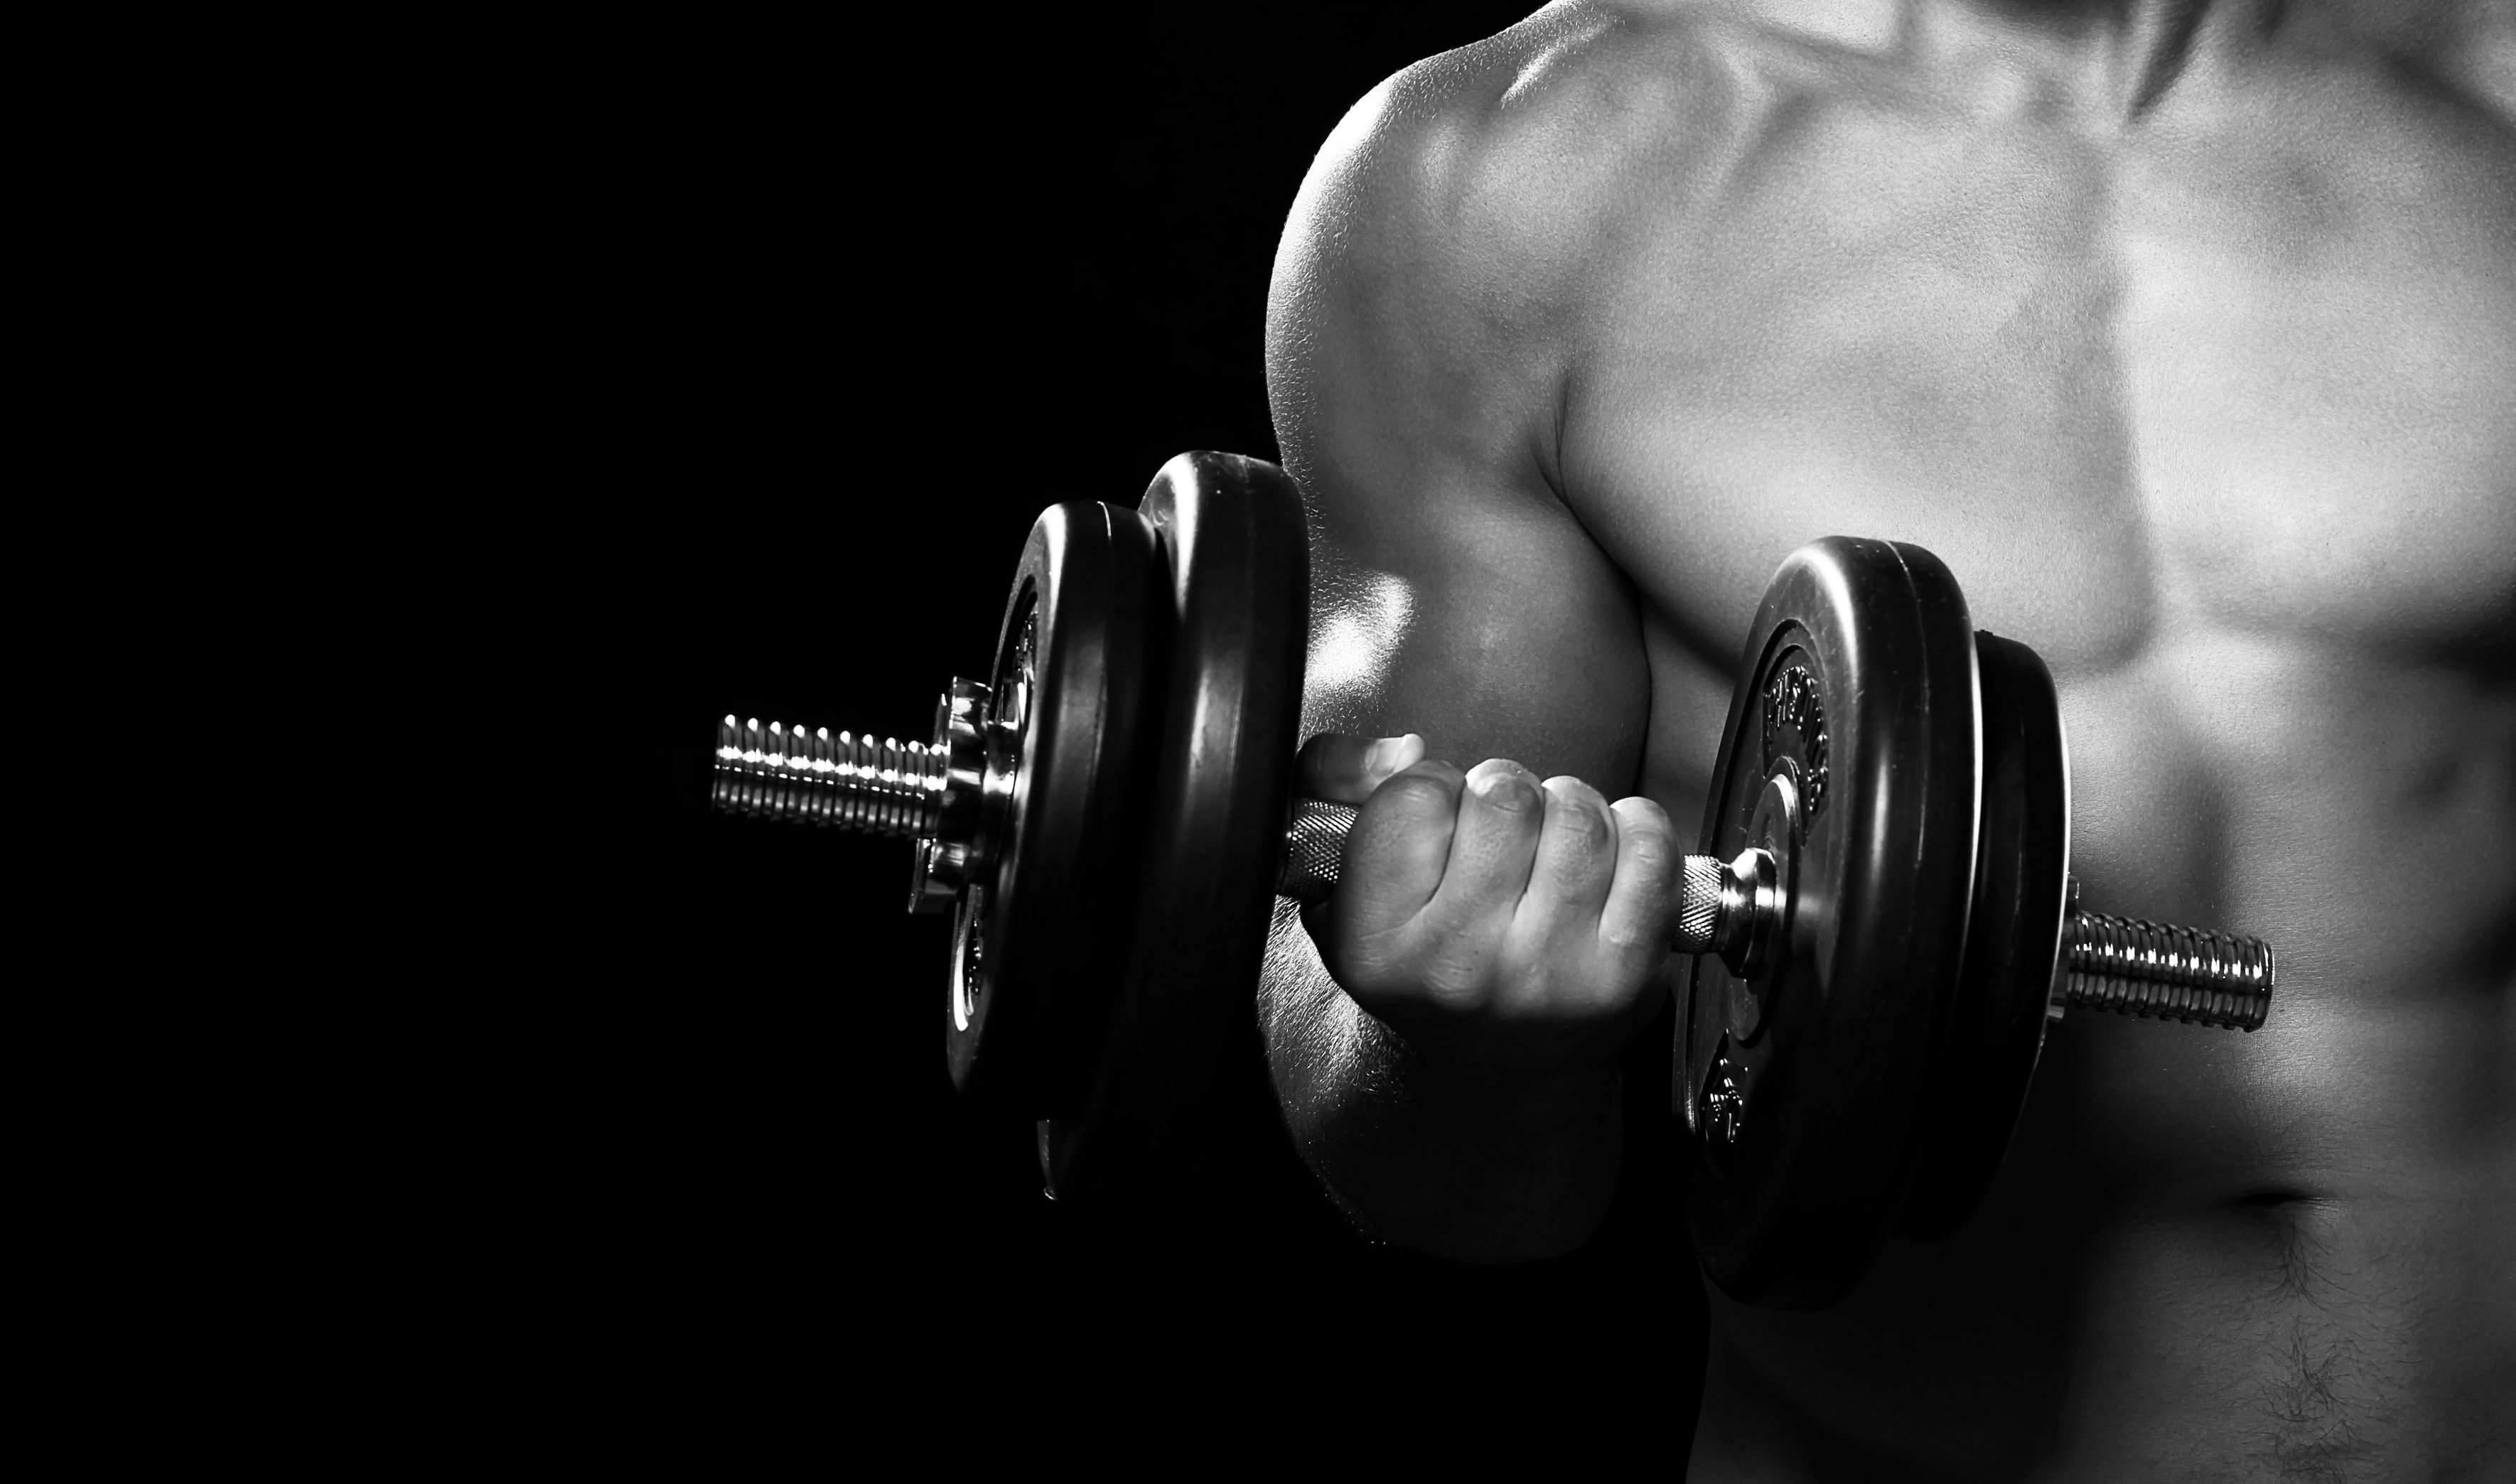 Pin On Sfondi Gym images hd wallpaper download